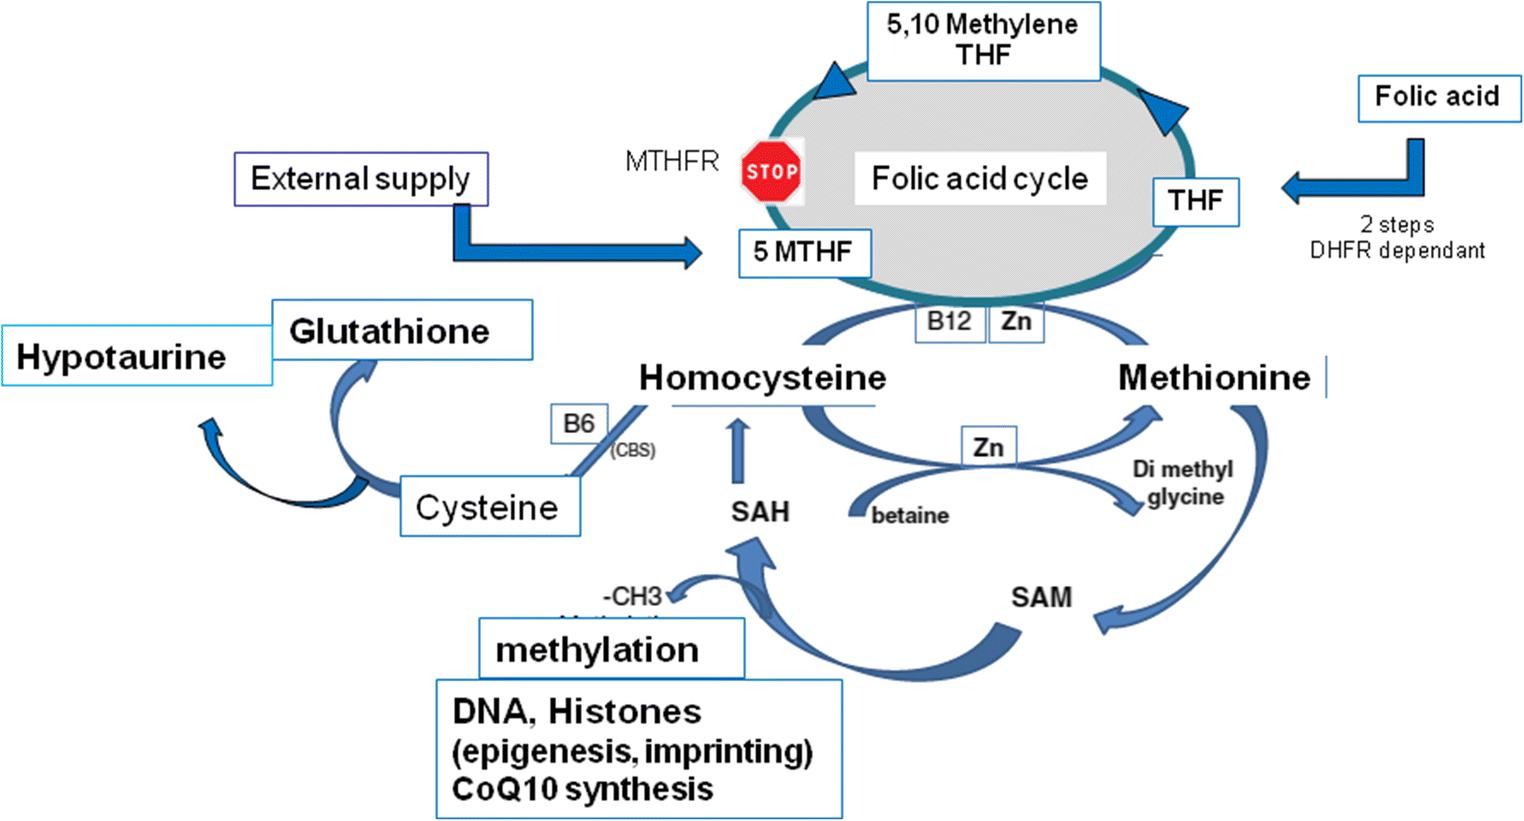 MTHFR isoform carriers  5-MTHF (5-methyl tetrahydrofolate) vs folic